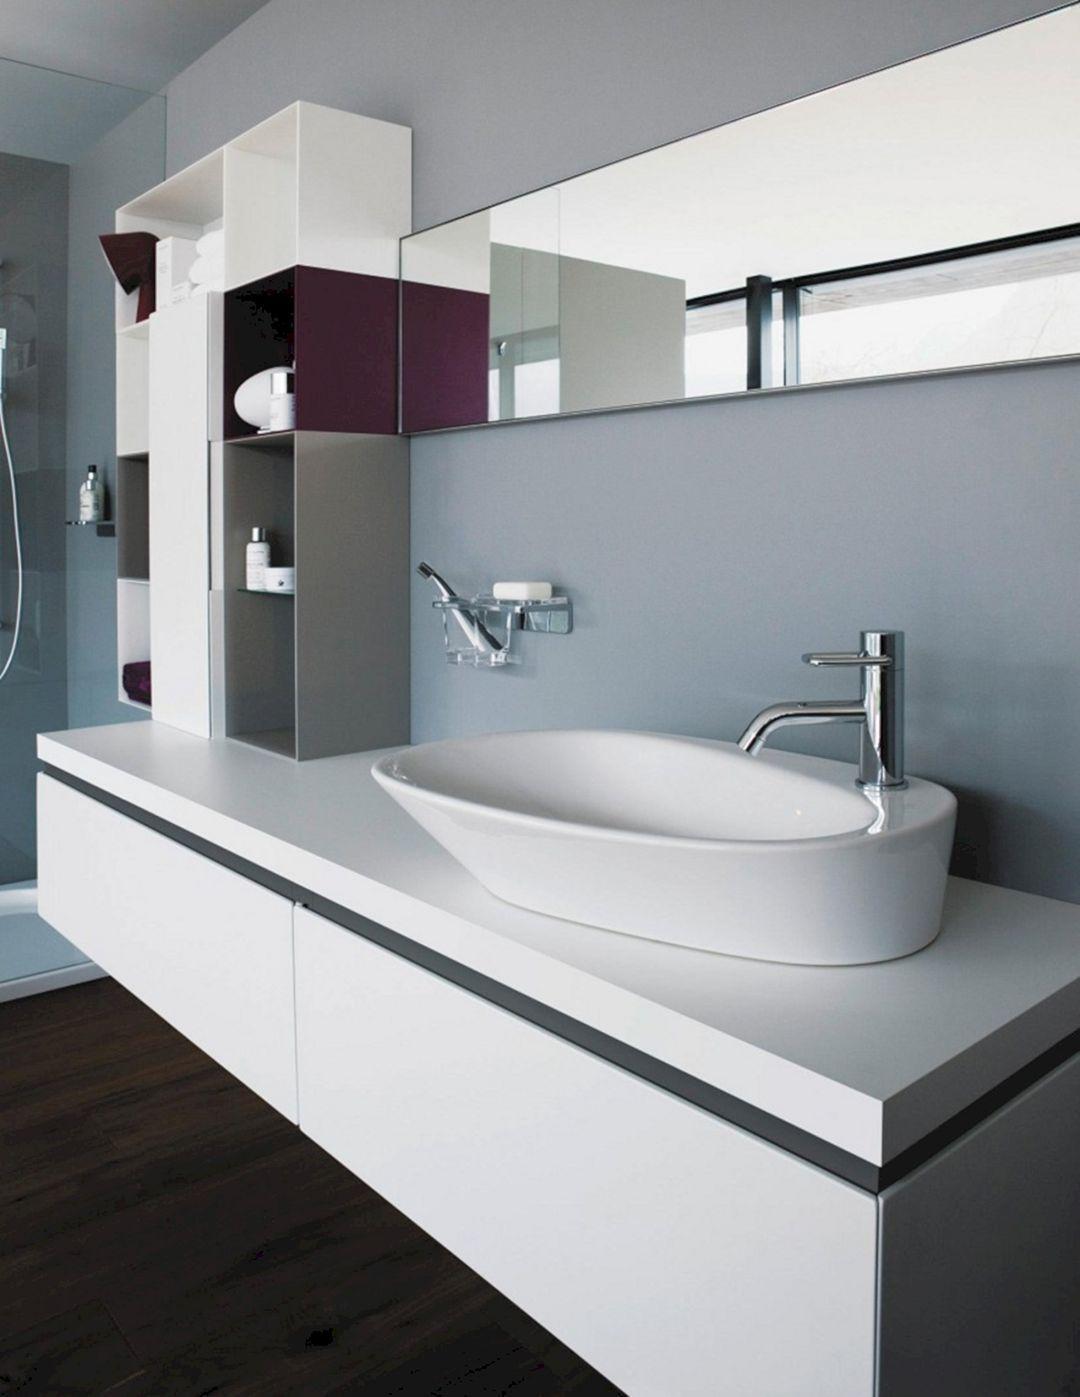 Breathtaking 7 Modern Bathroom Sink Design Ideas To Make Your Activities Comfortable Bathroom Sink Desi Bathroom Sink Design Sink Design Modern Master Bathroom